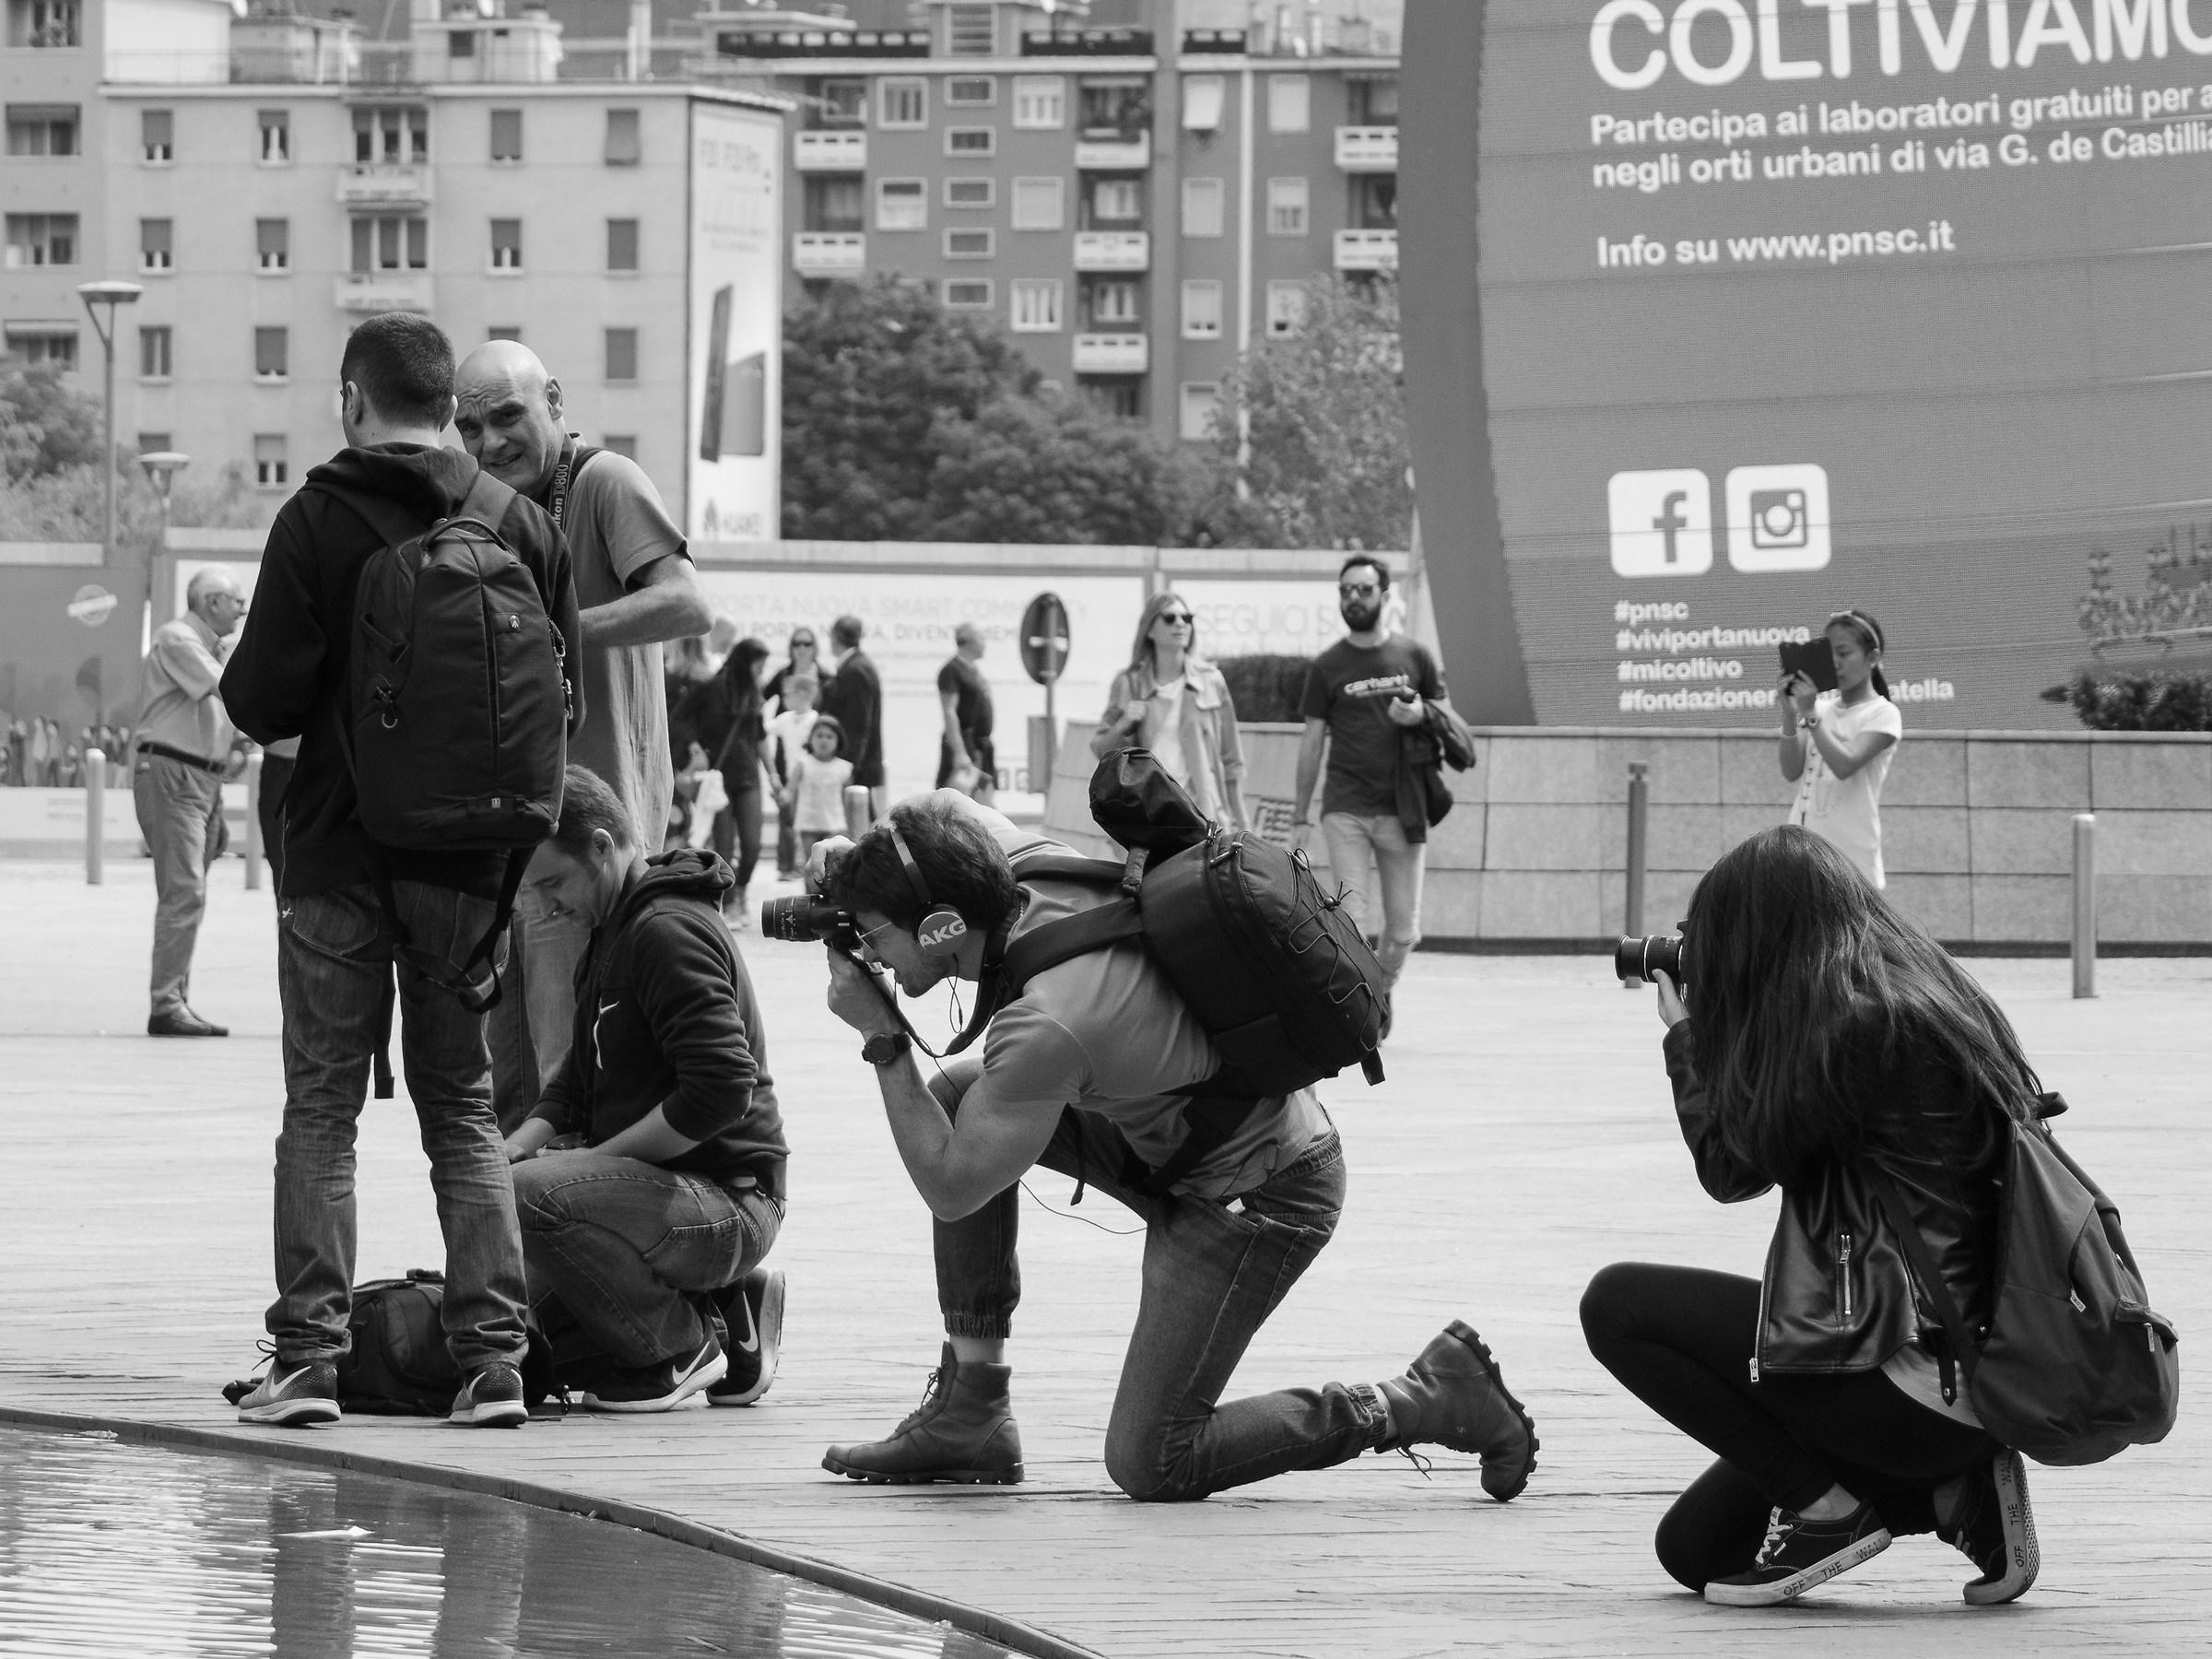 I photograph, you photographers...